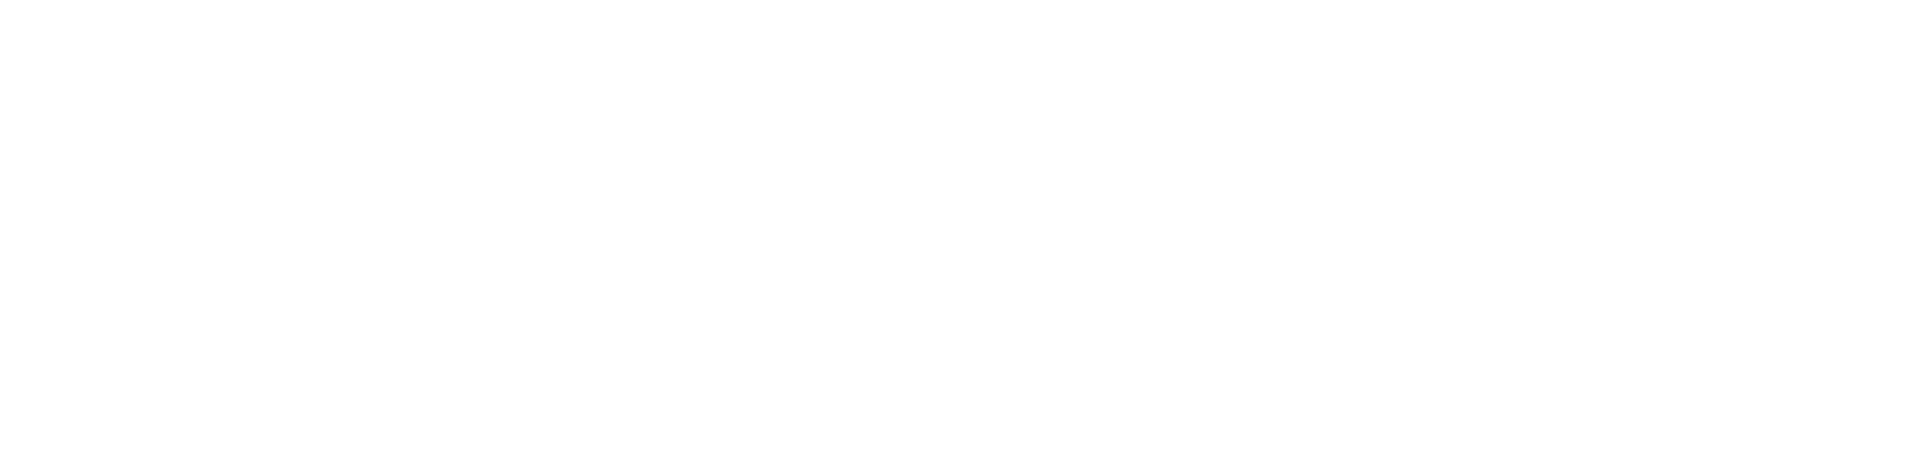 Logo for University of Brighton